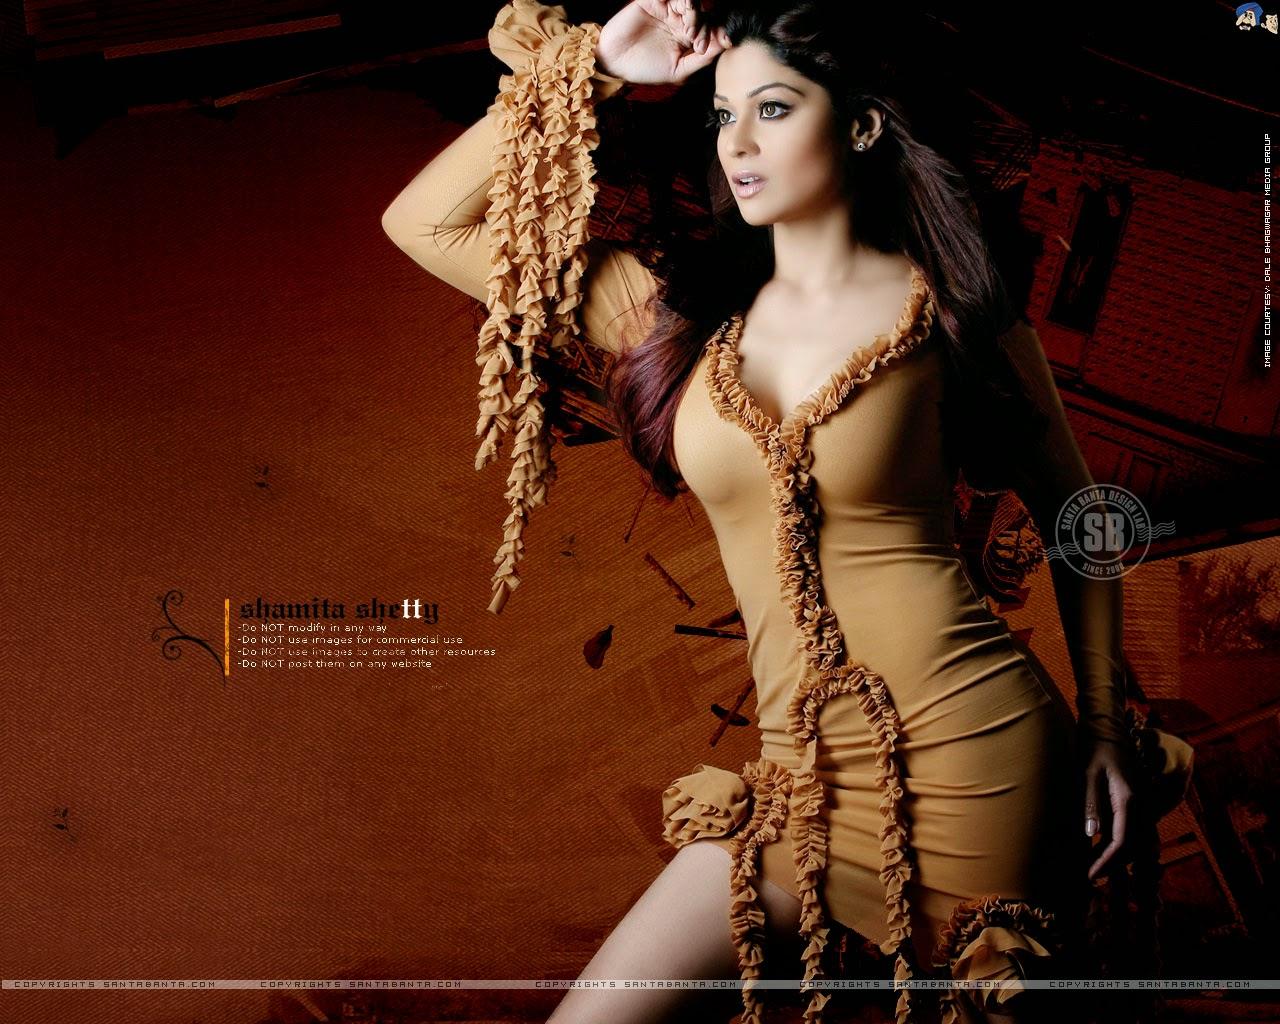 Koleksi Foto Shamita Shetty Terseksi 11